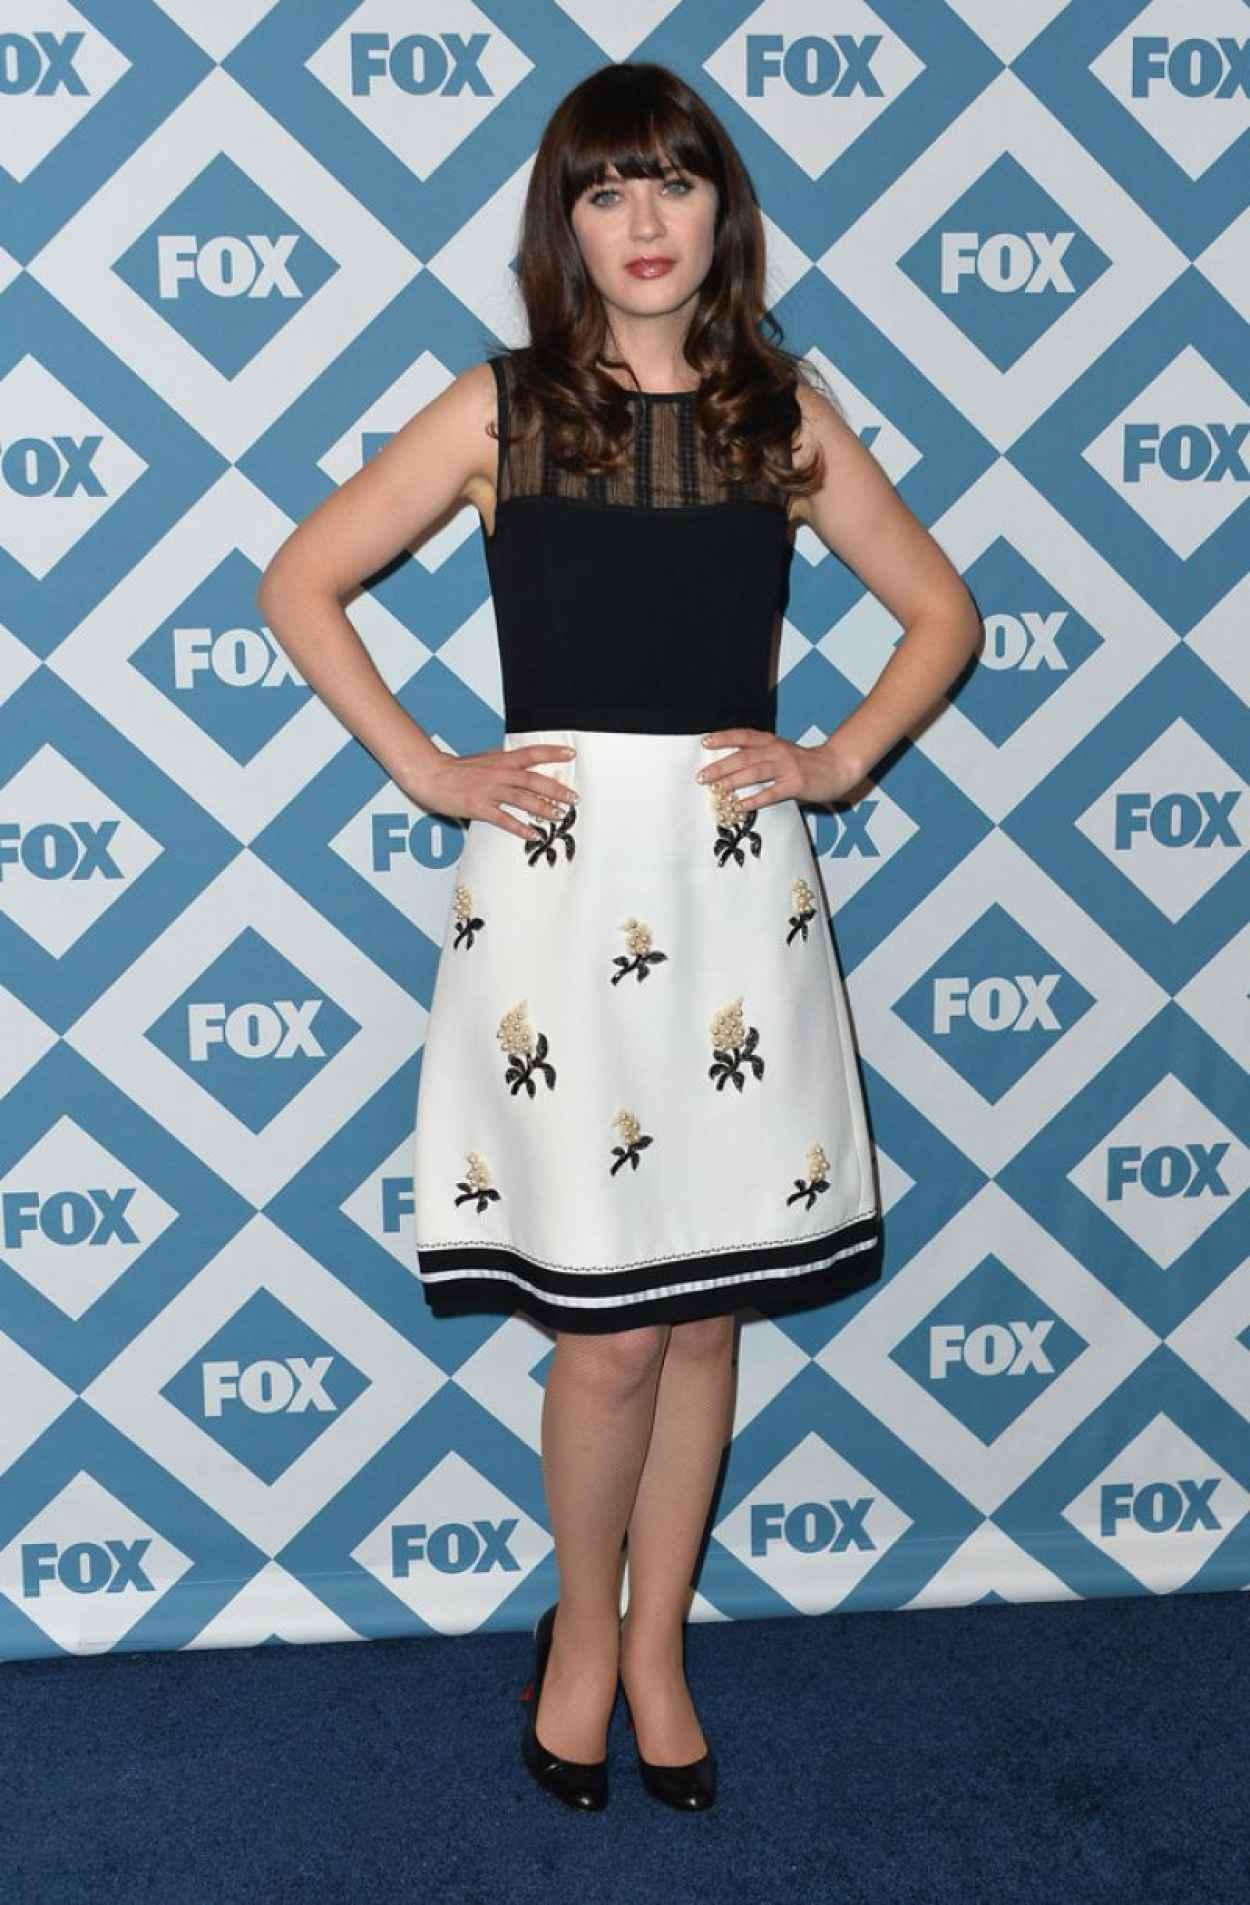 Zooey Deschanel Attends 2015 Fox All-Star Party in Pasadena-1